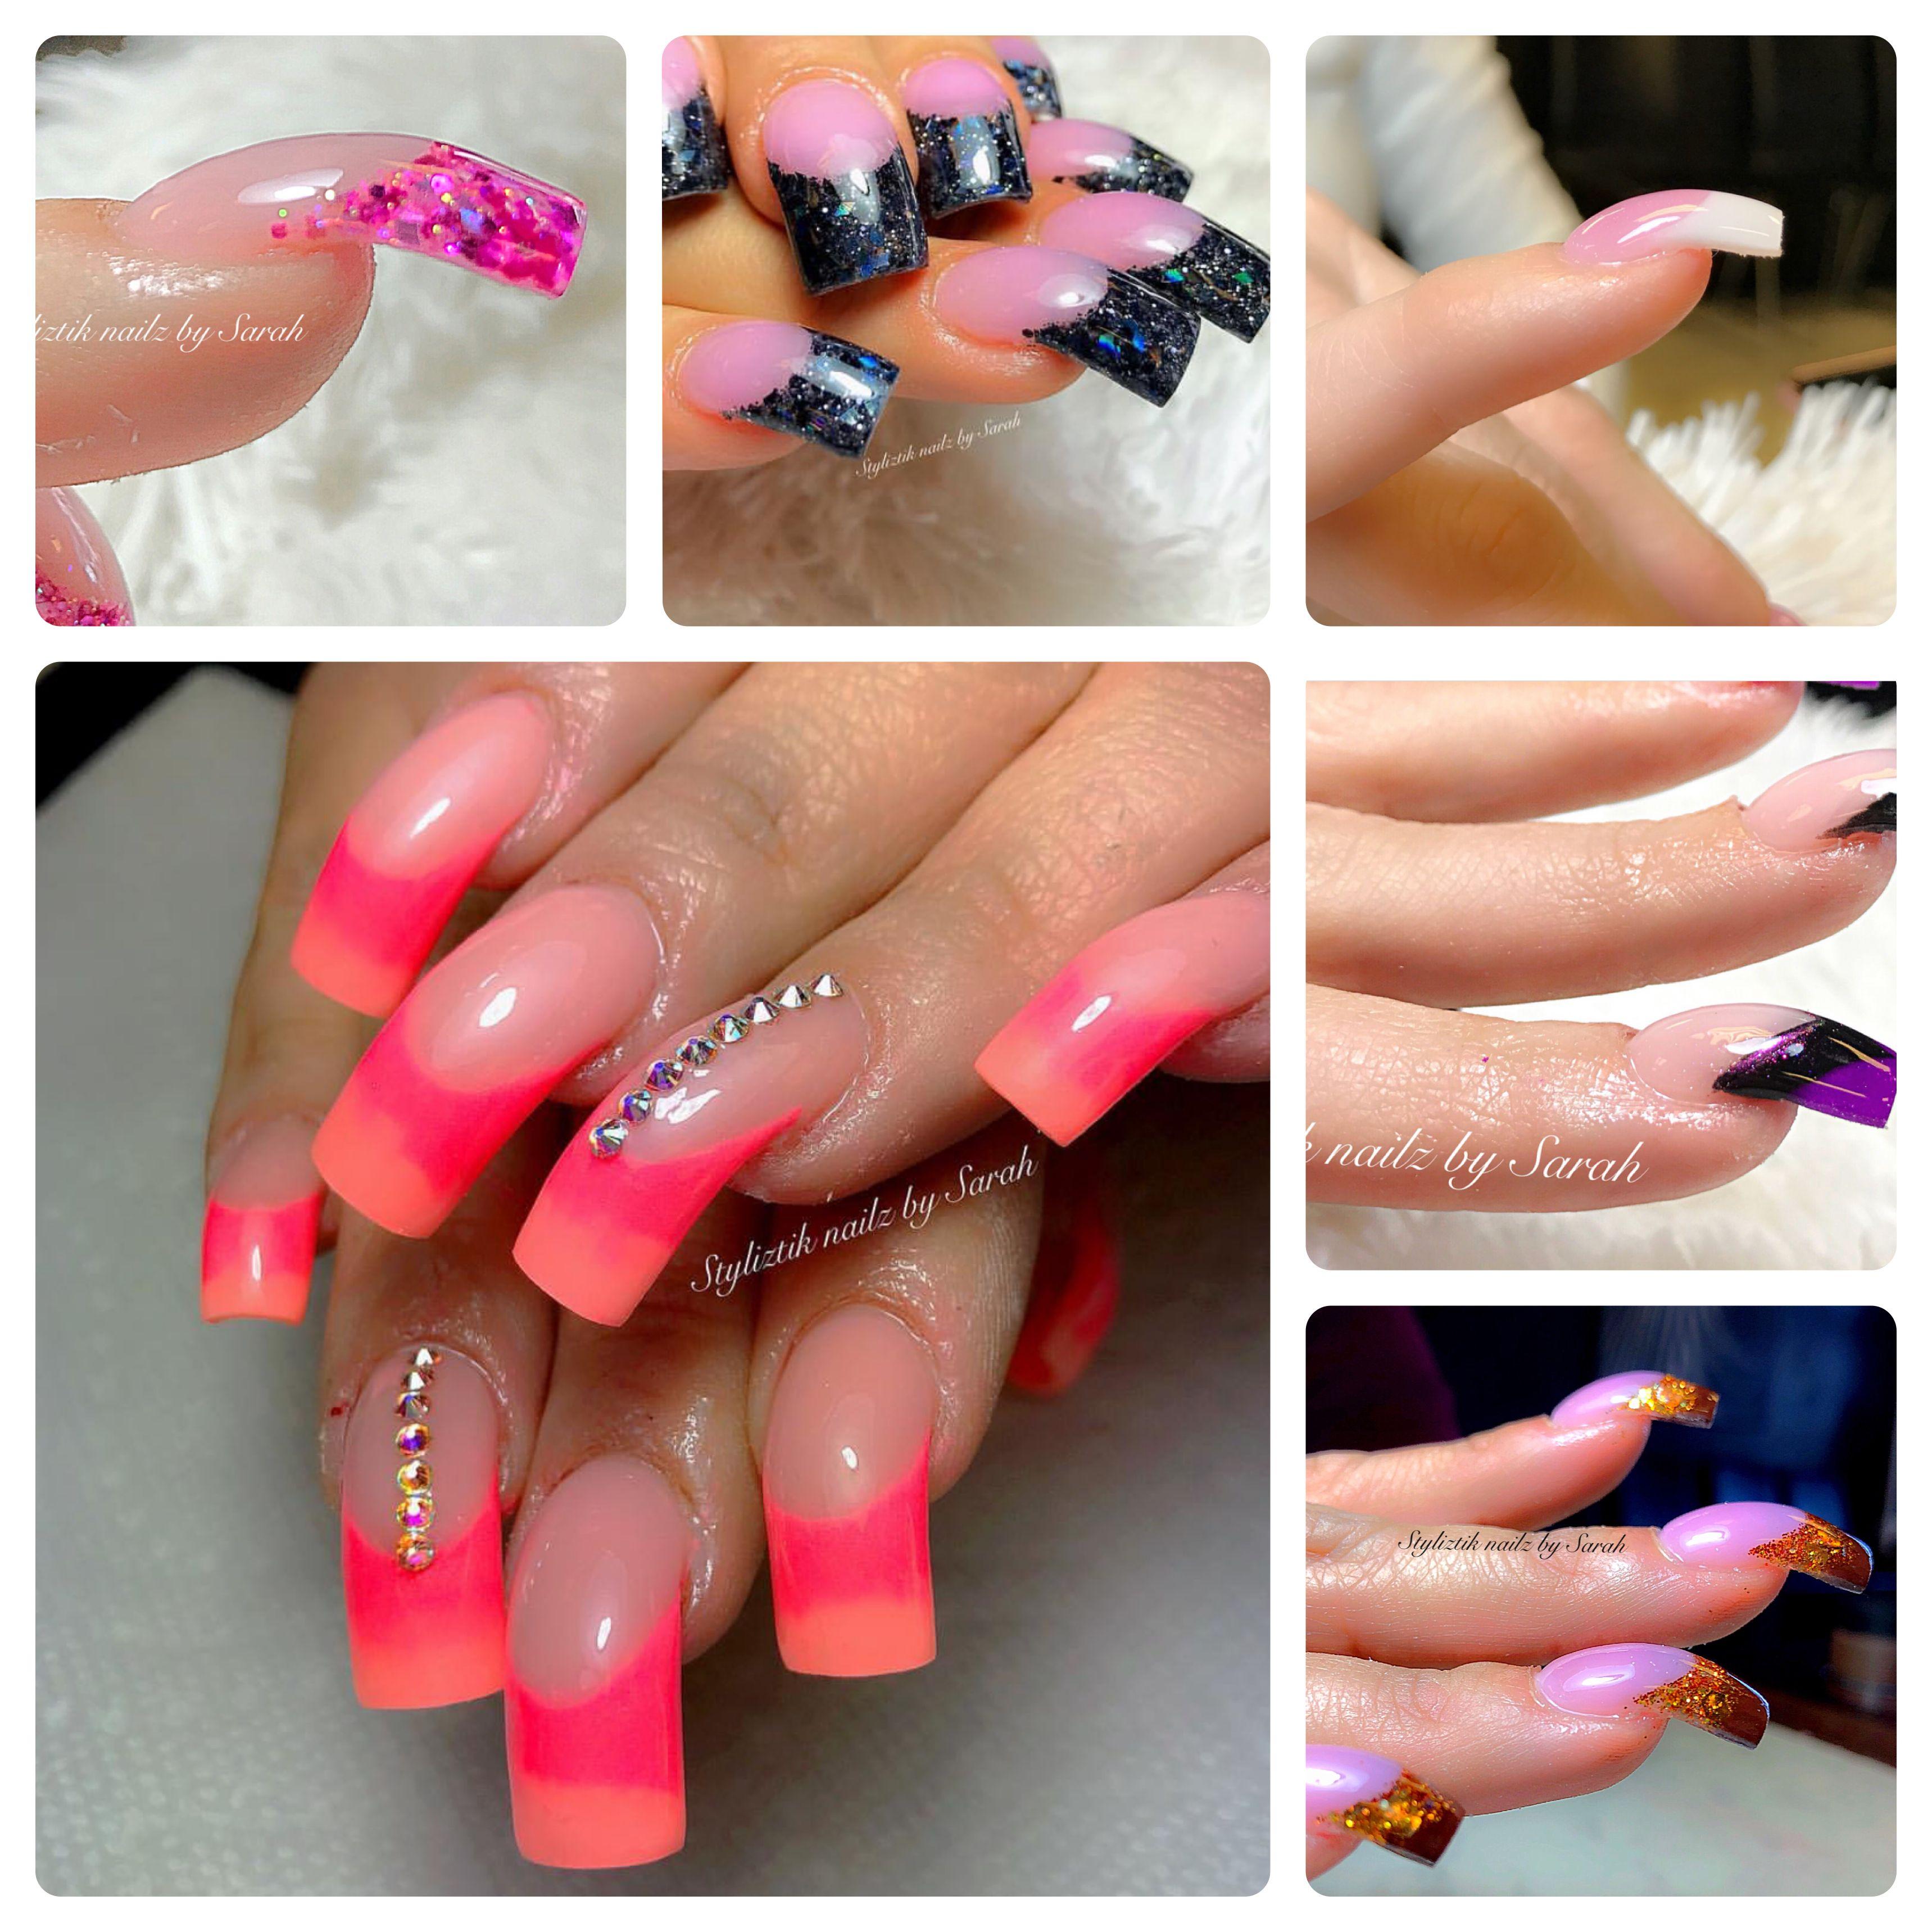 Smooth transition curve nails by Sarah @ Styliztik nailz | nails I ...